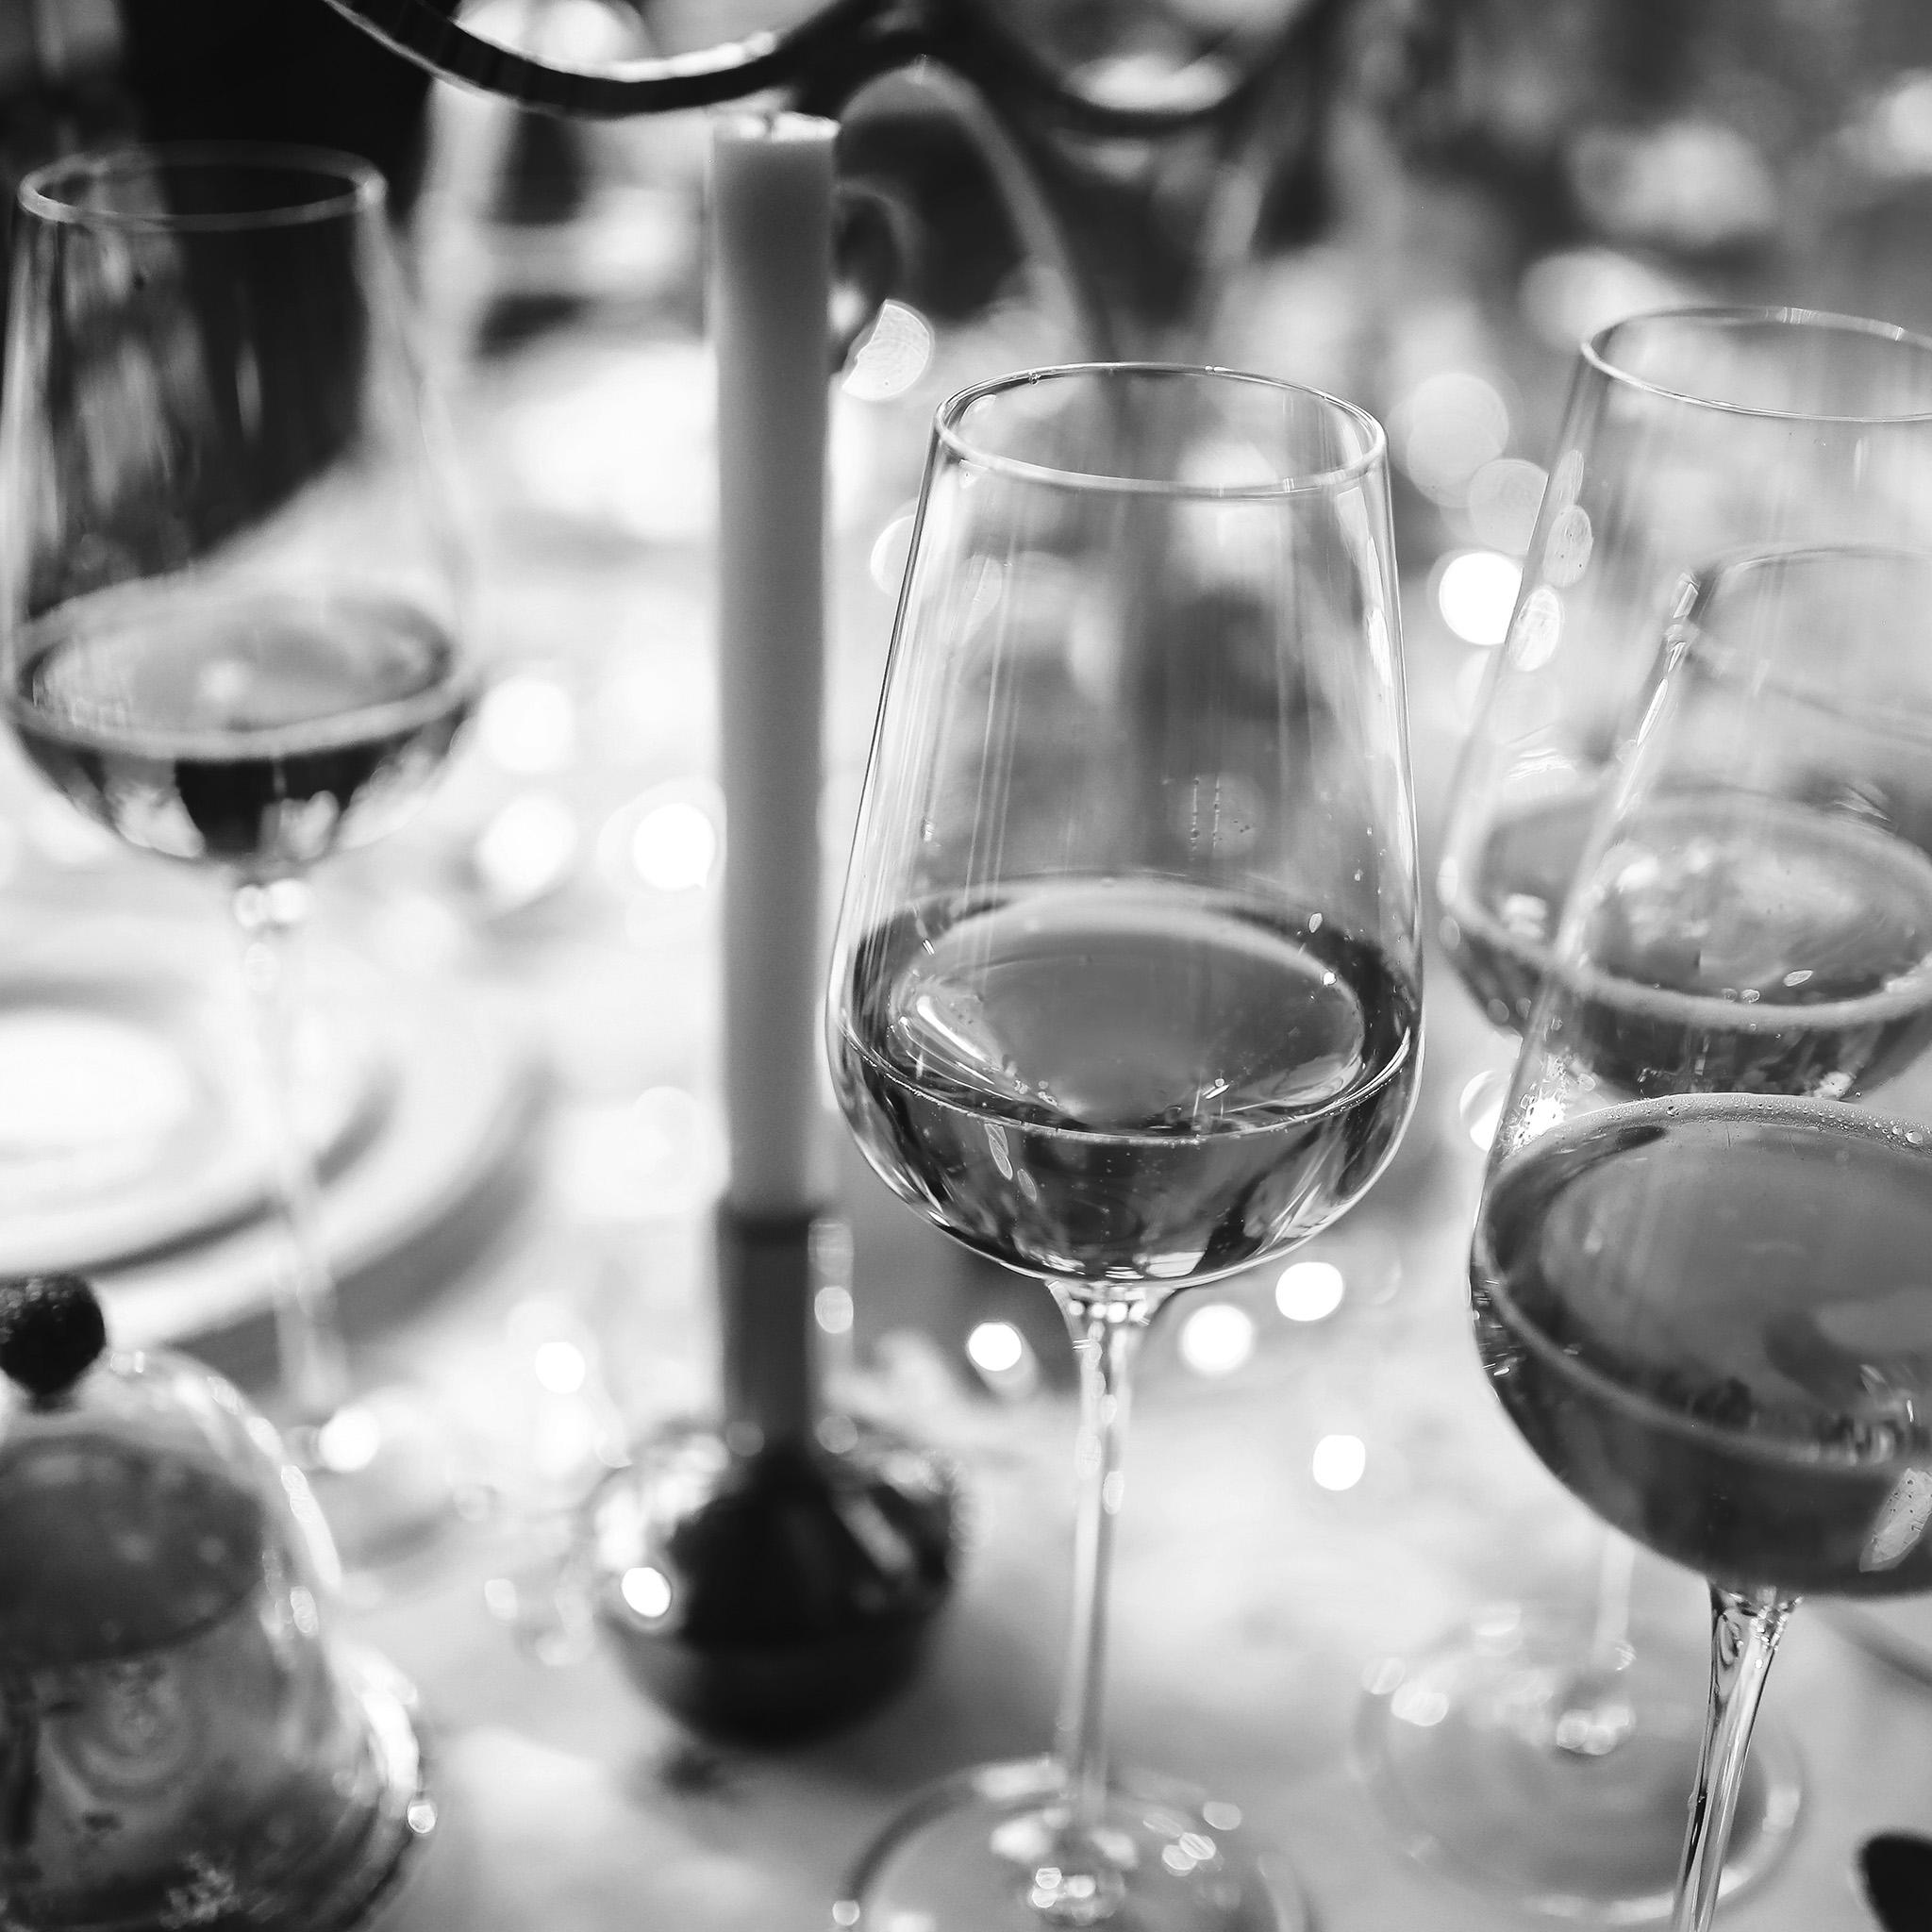 Mv31 Party Wine Glass City Life Love Food Dark Bw Wallpaper